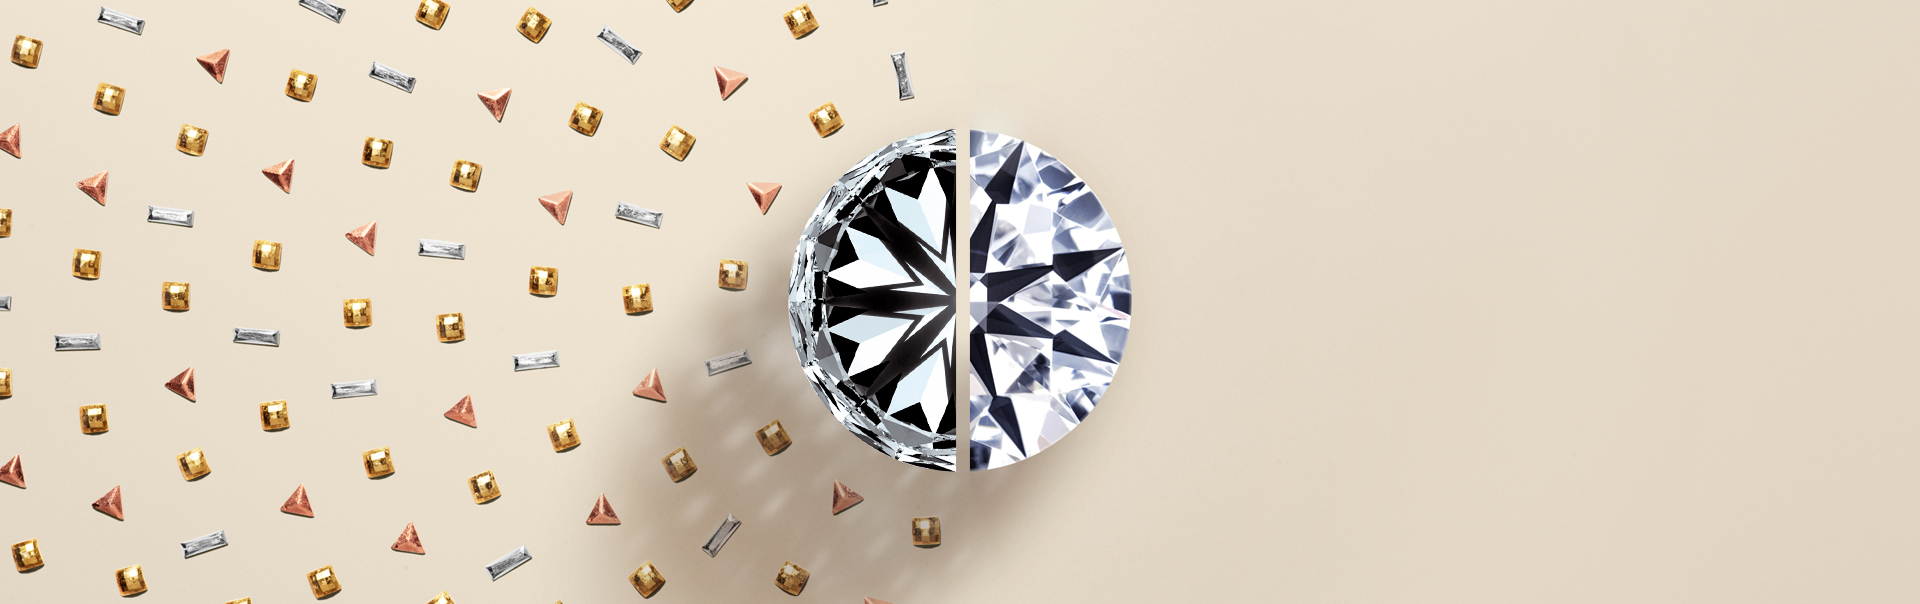 63d0602577 Shop Engagement Rings and Loose Diamonds Online | JamesAllen.com